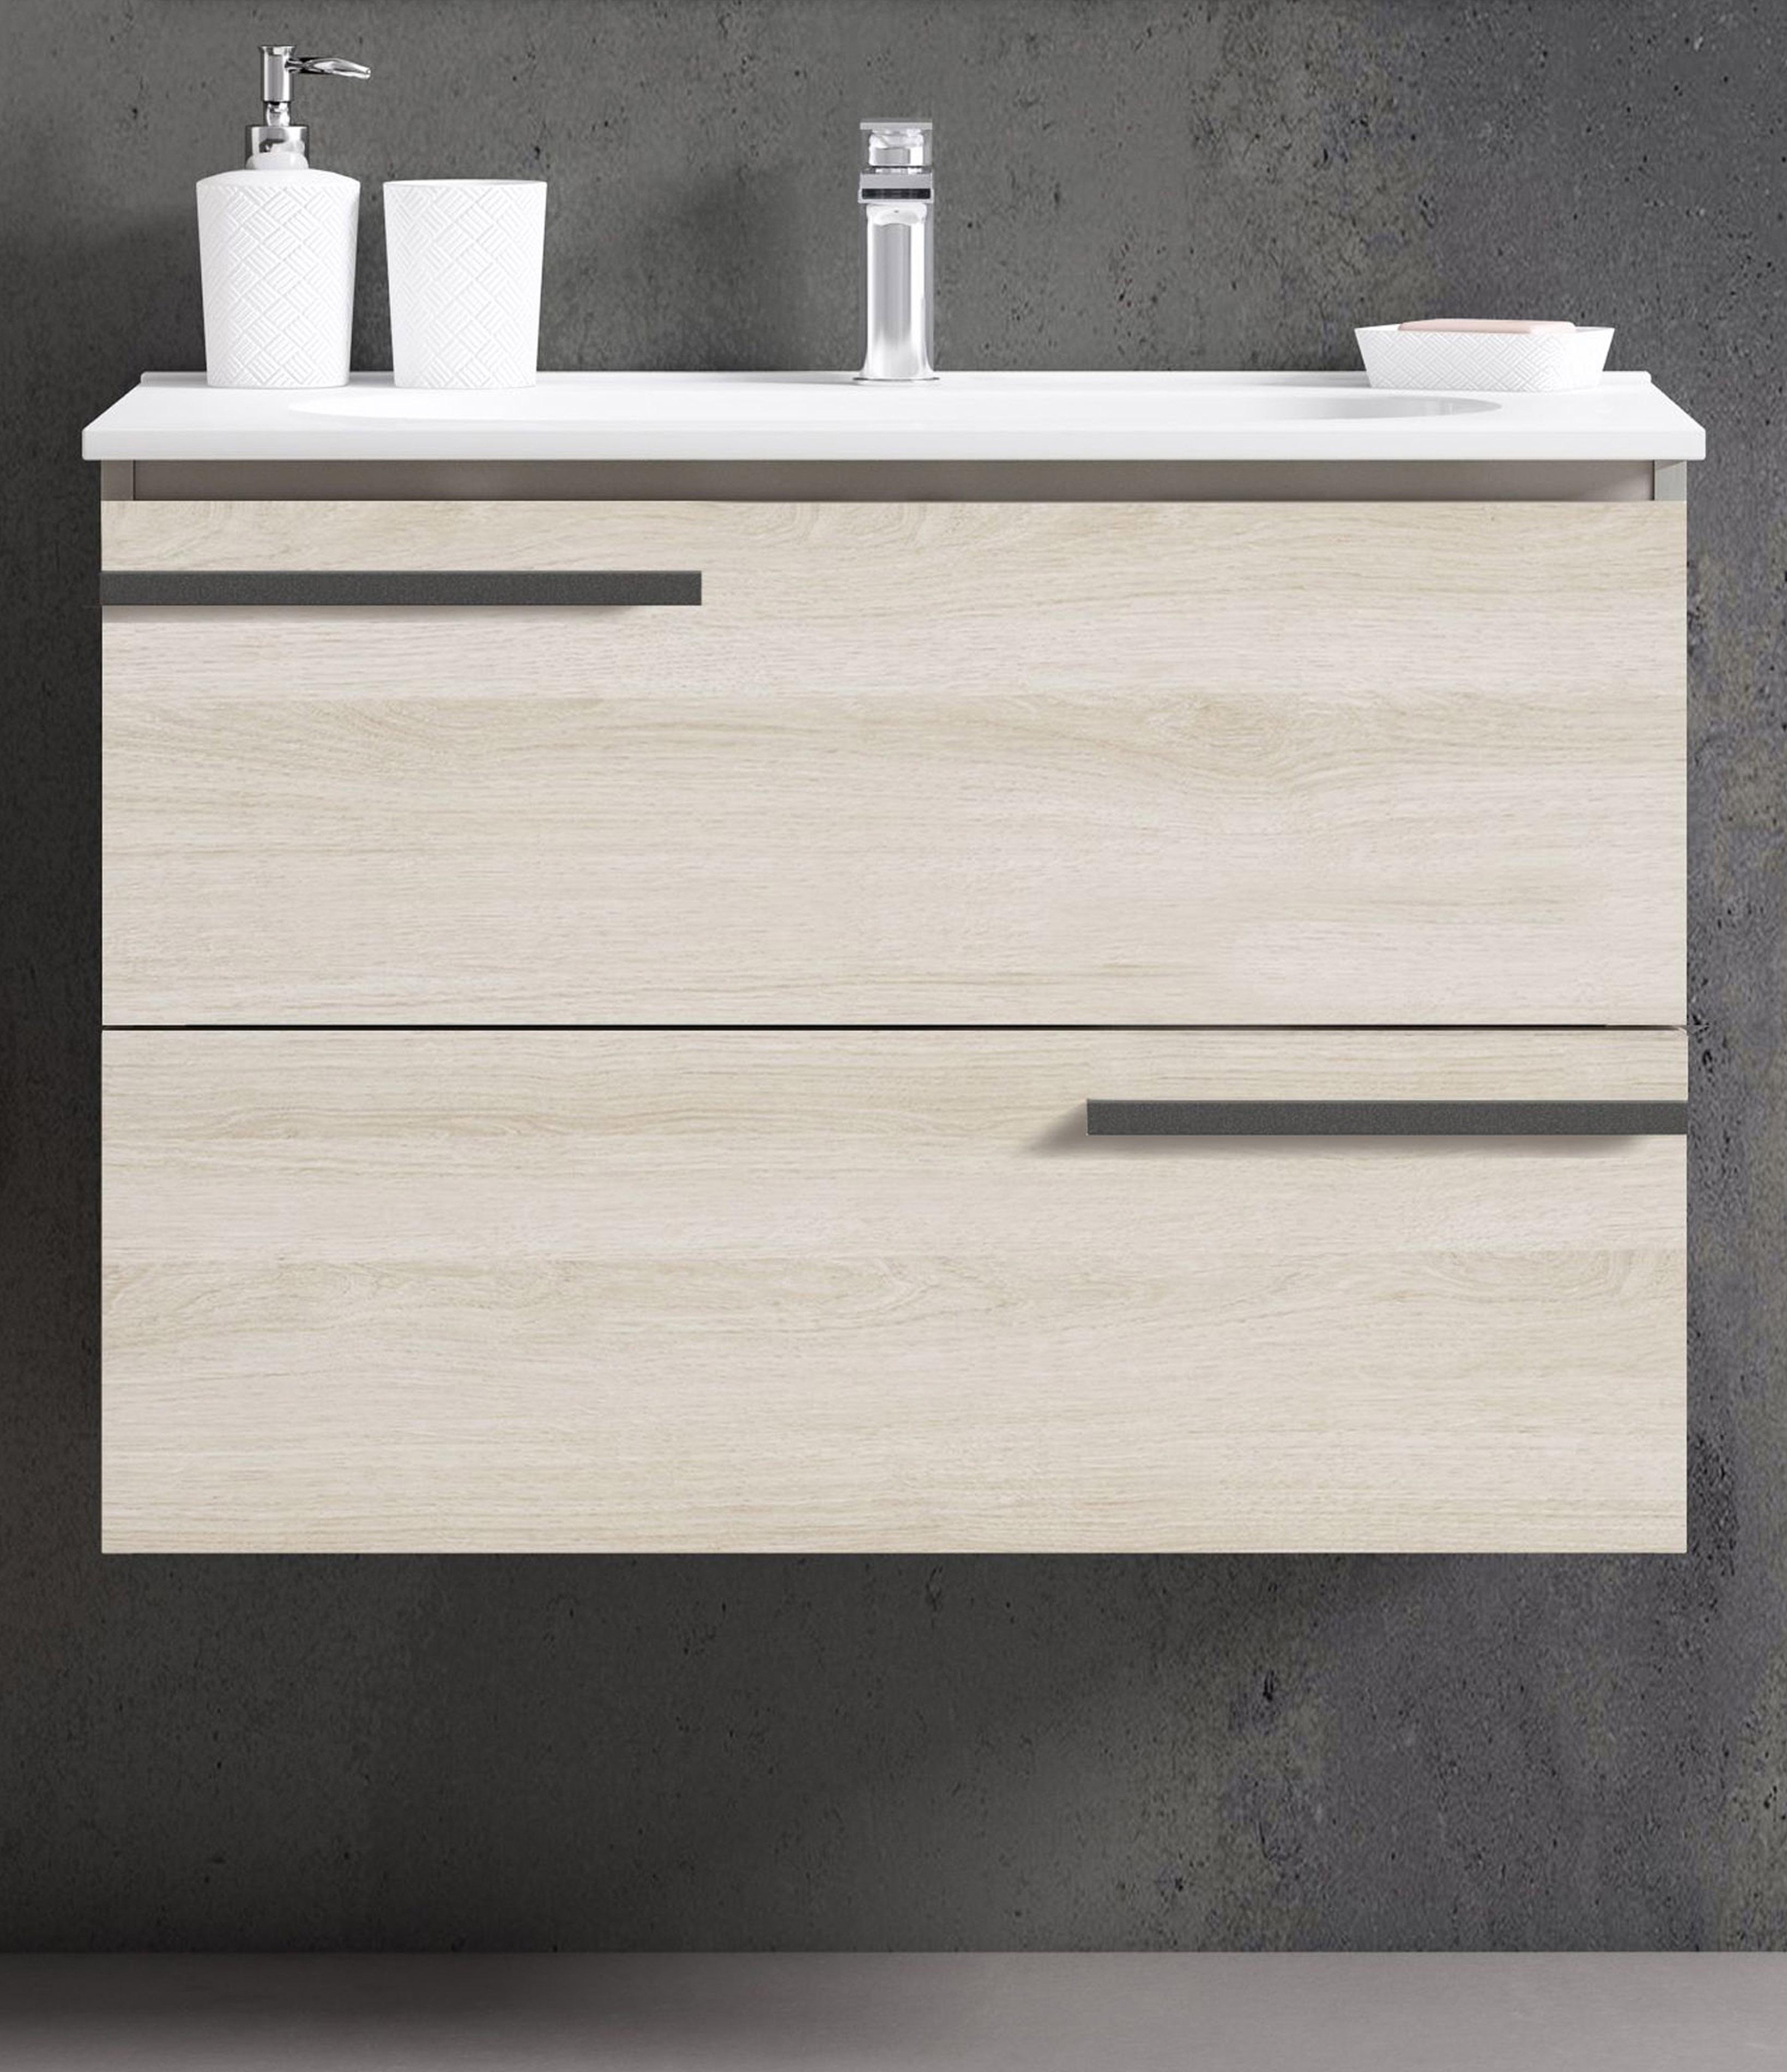 "32"" Single Sink Vanity 2 Drawer Ceramic Sink with 4 Color Options"